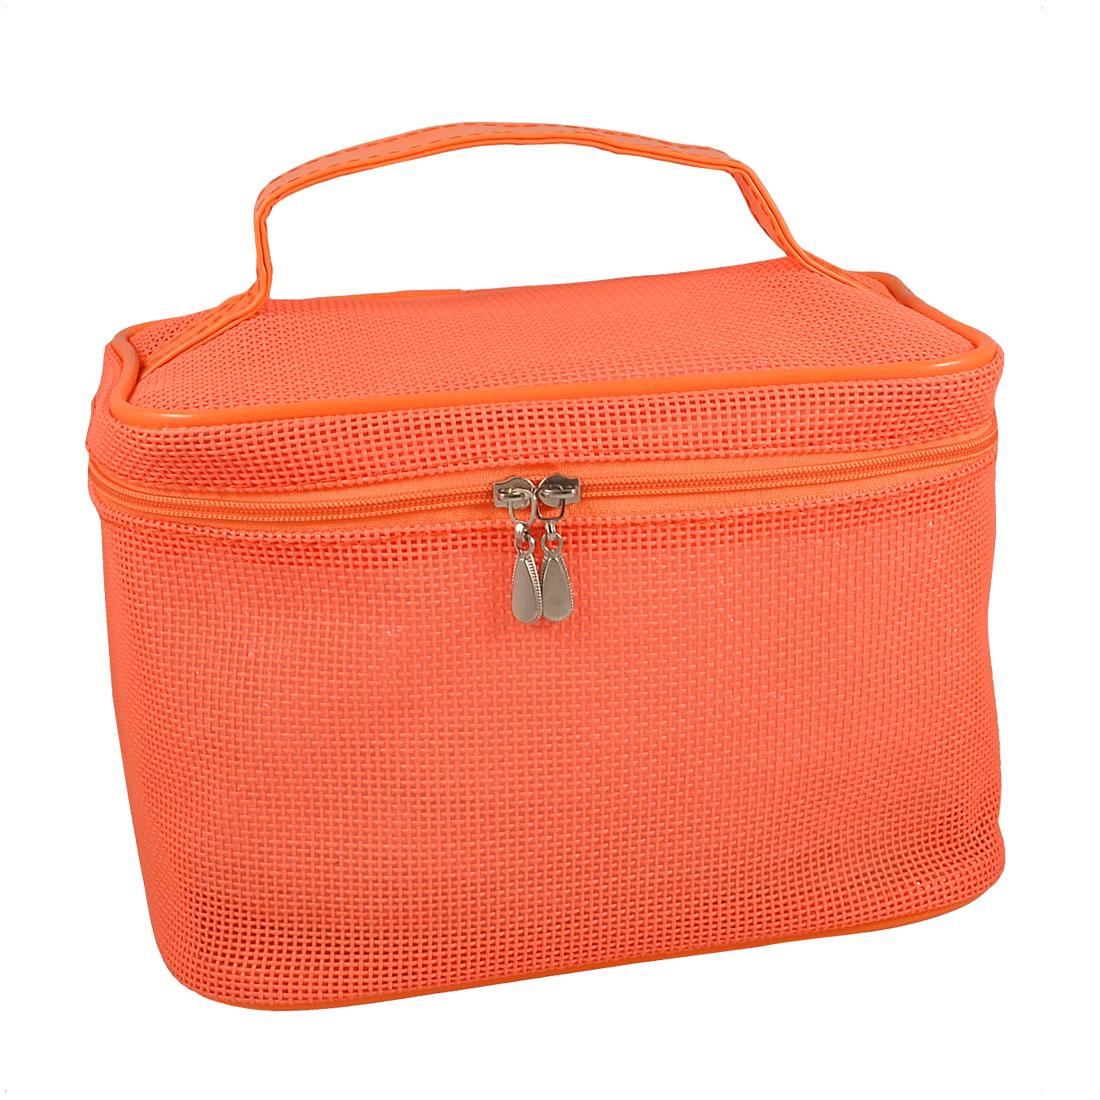 Handheld Mesh Two Way Zipper Mirror Makeup Cosmetic Bag Organizer Orange